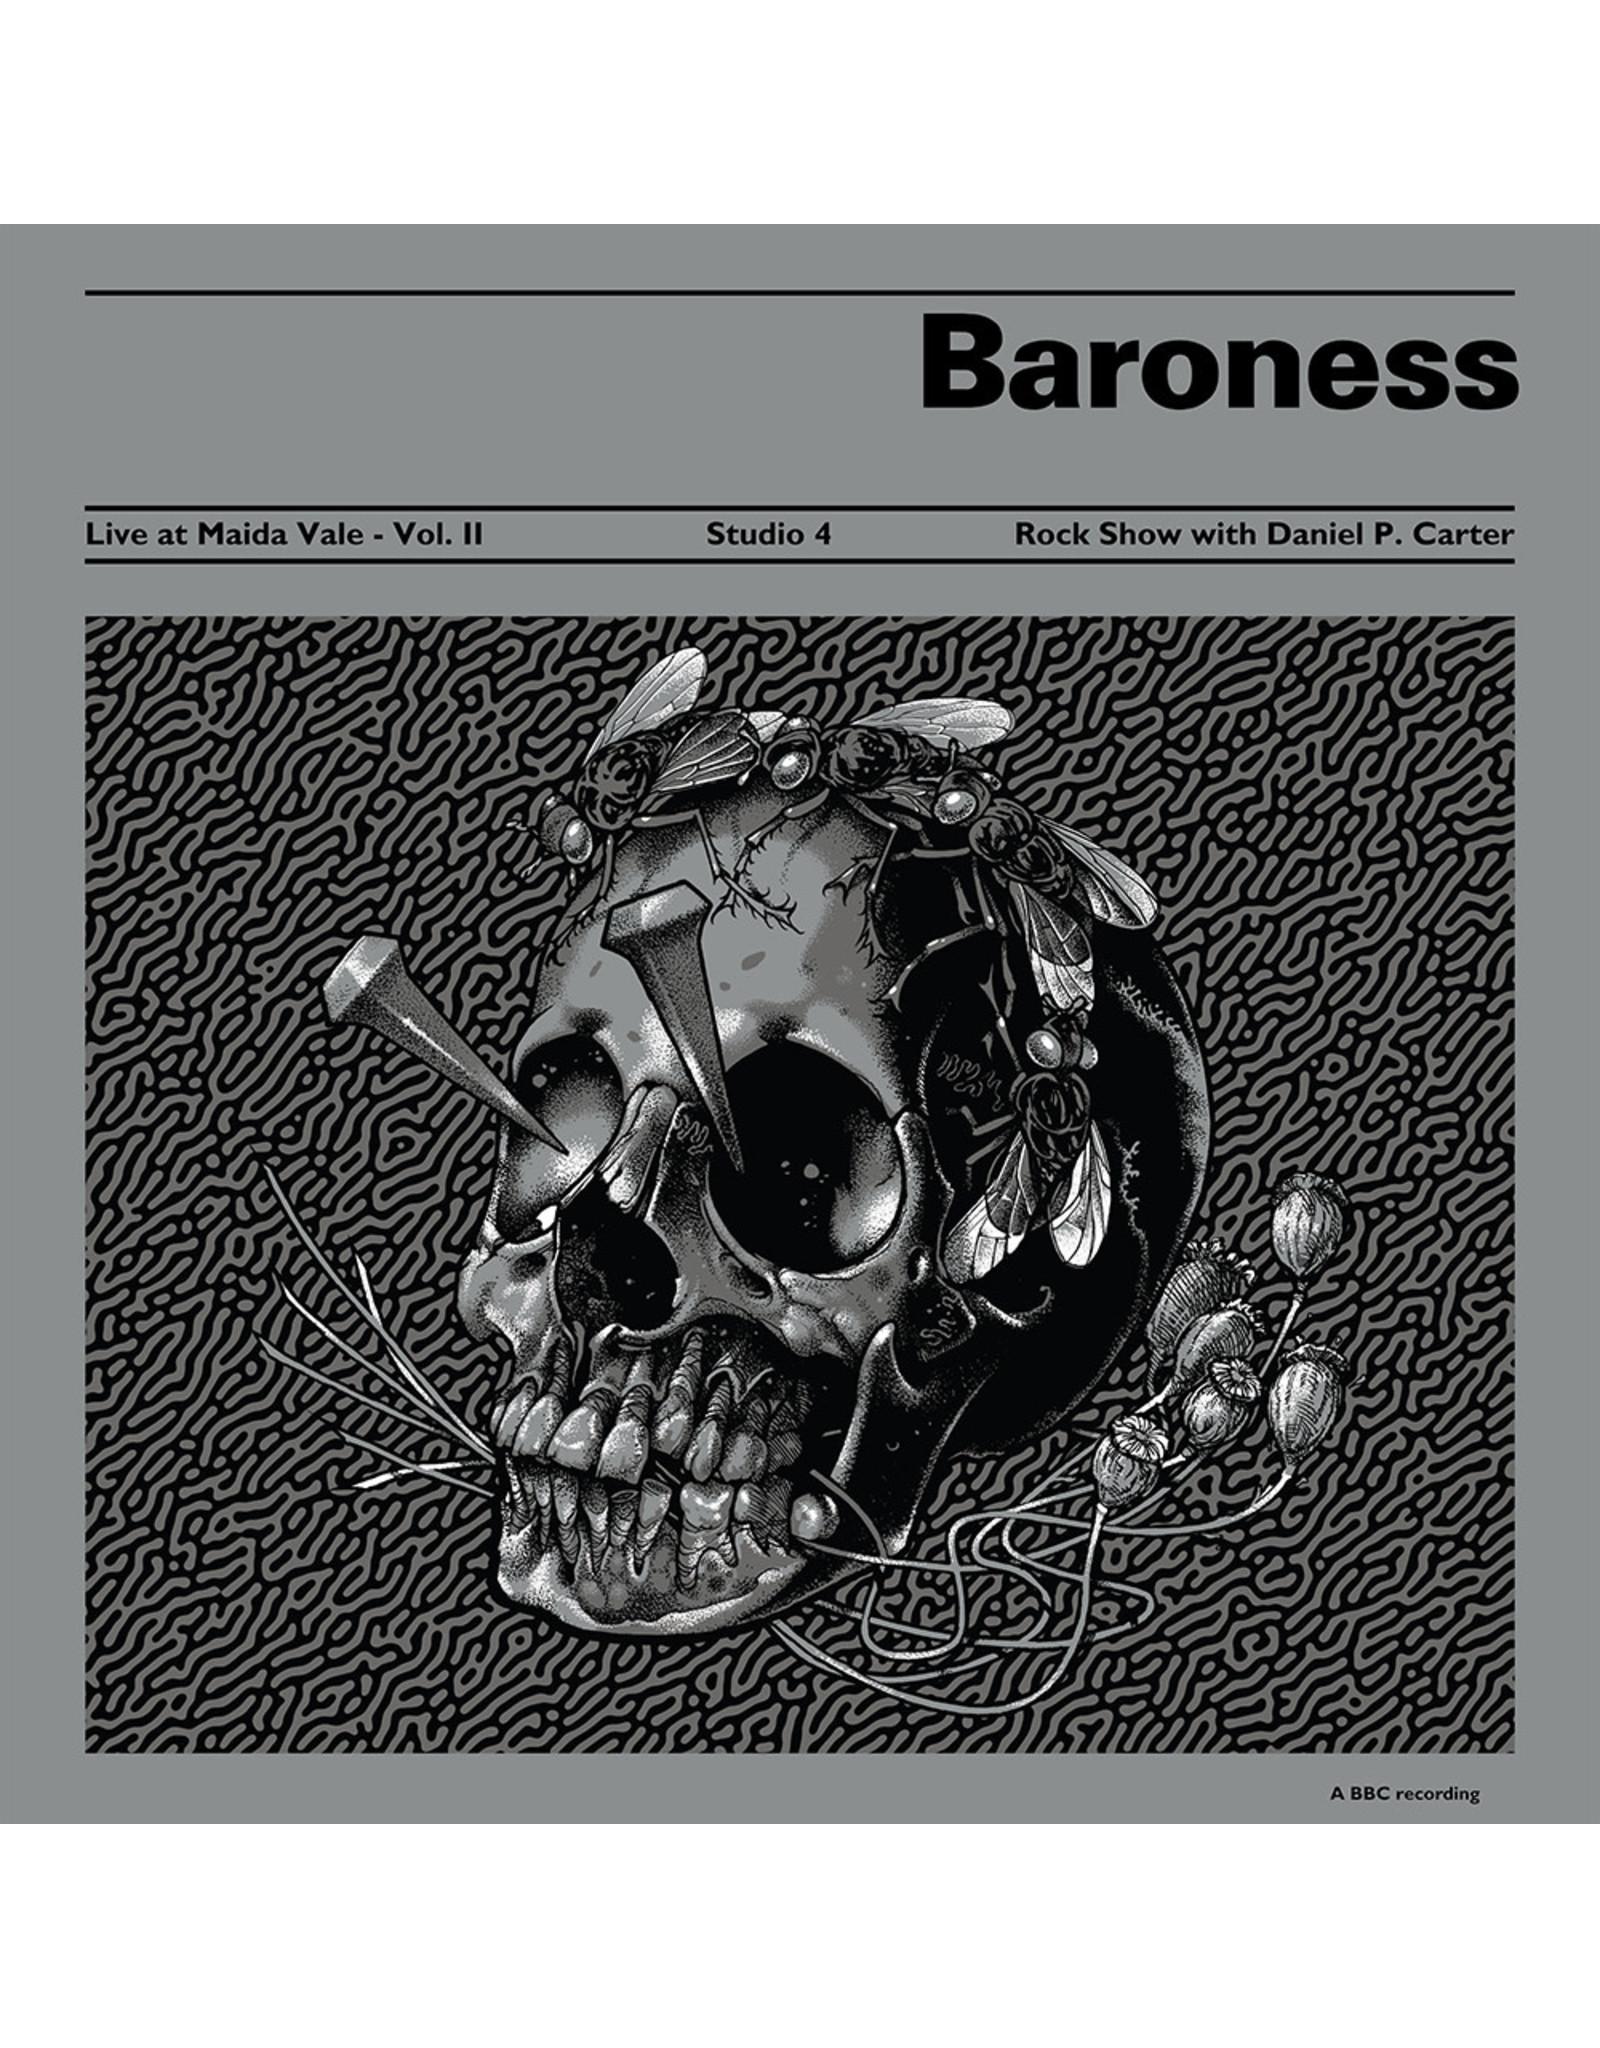 Baroness - Live at Maida Vale BBC Vol. II (Splattered Vinyl) LP